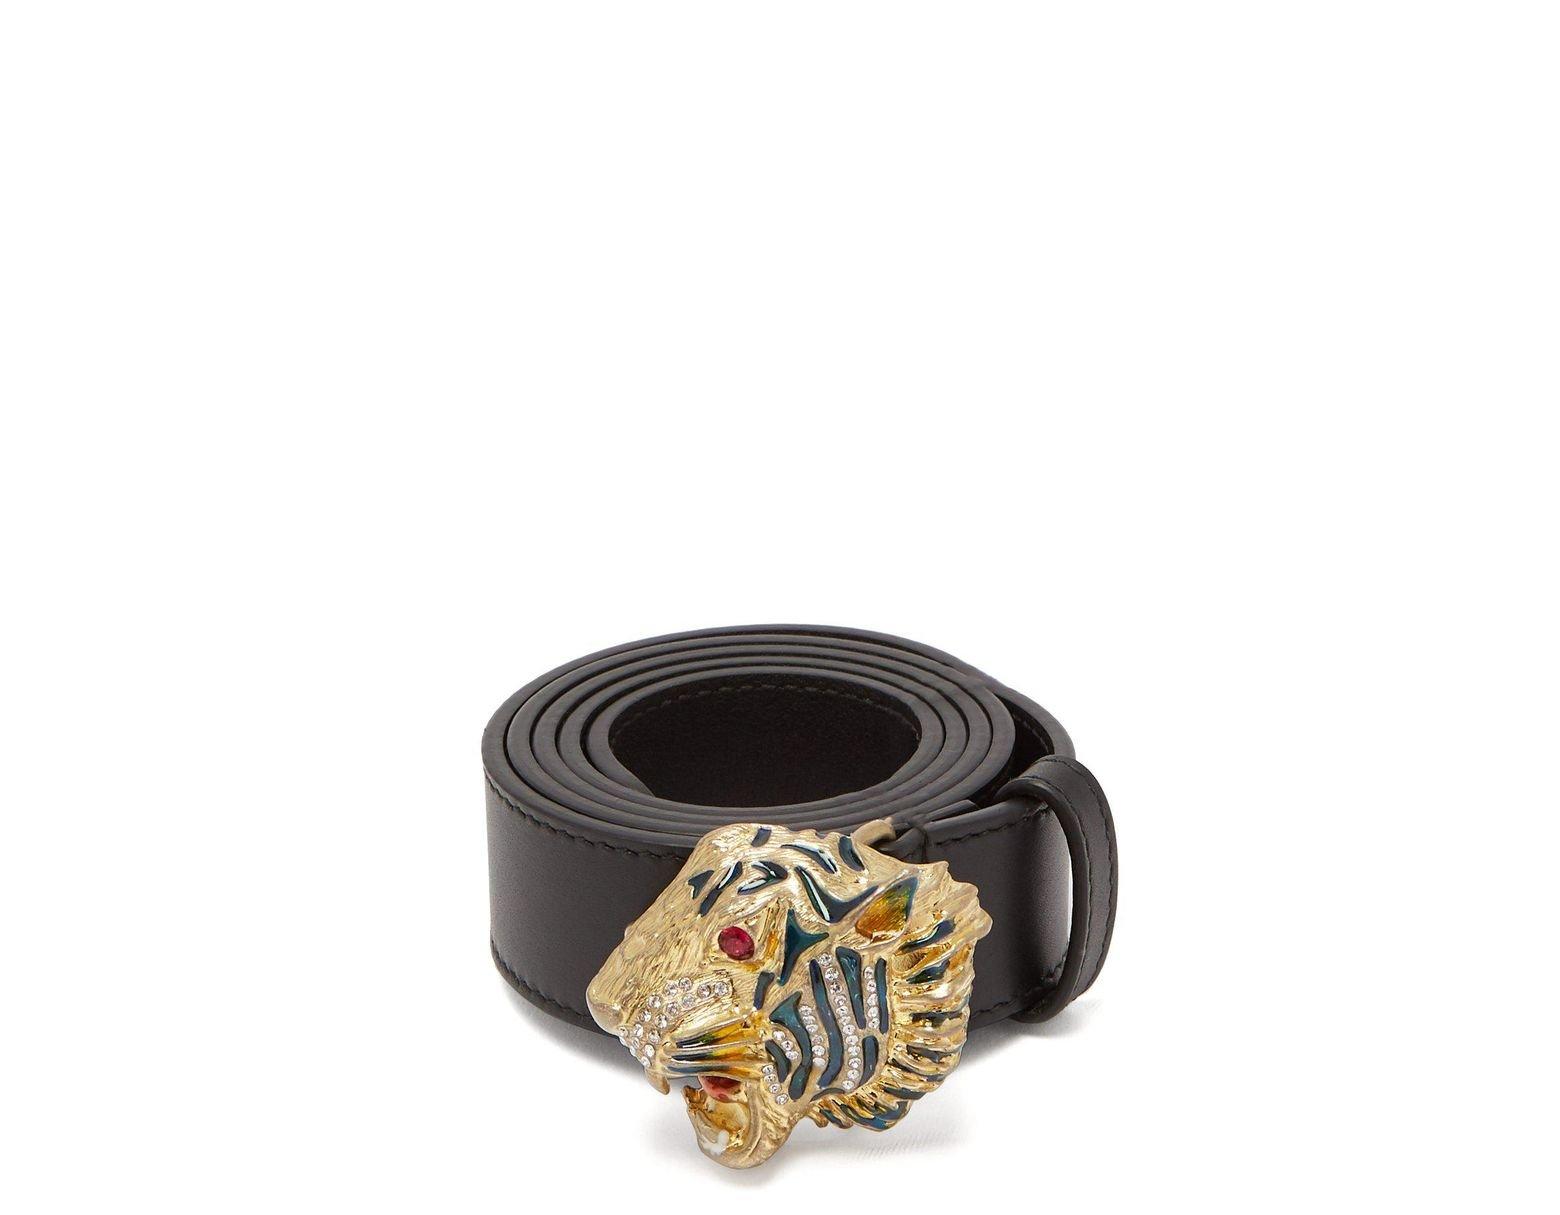 45c11780c Gucci Tiger Head Belt in Black - Save 25% - Lyst